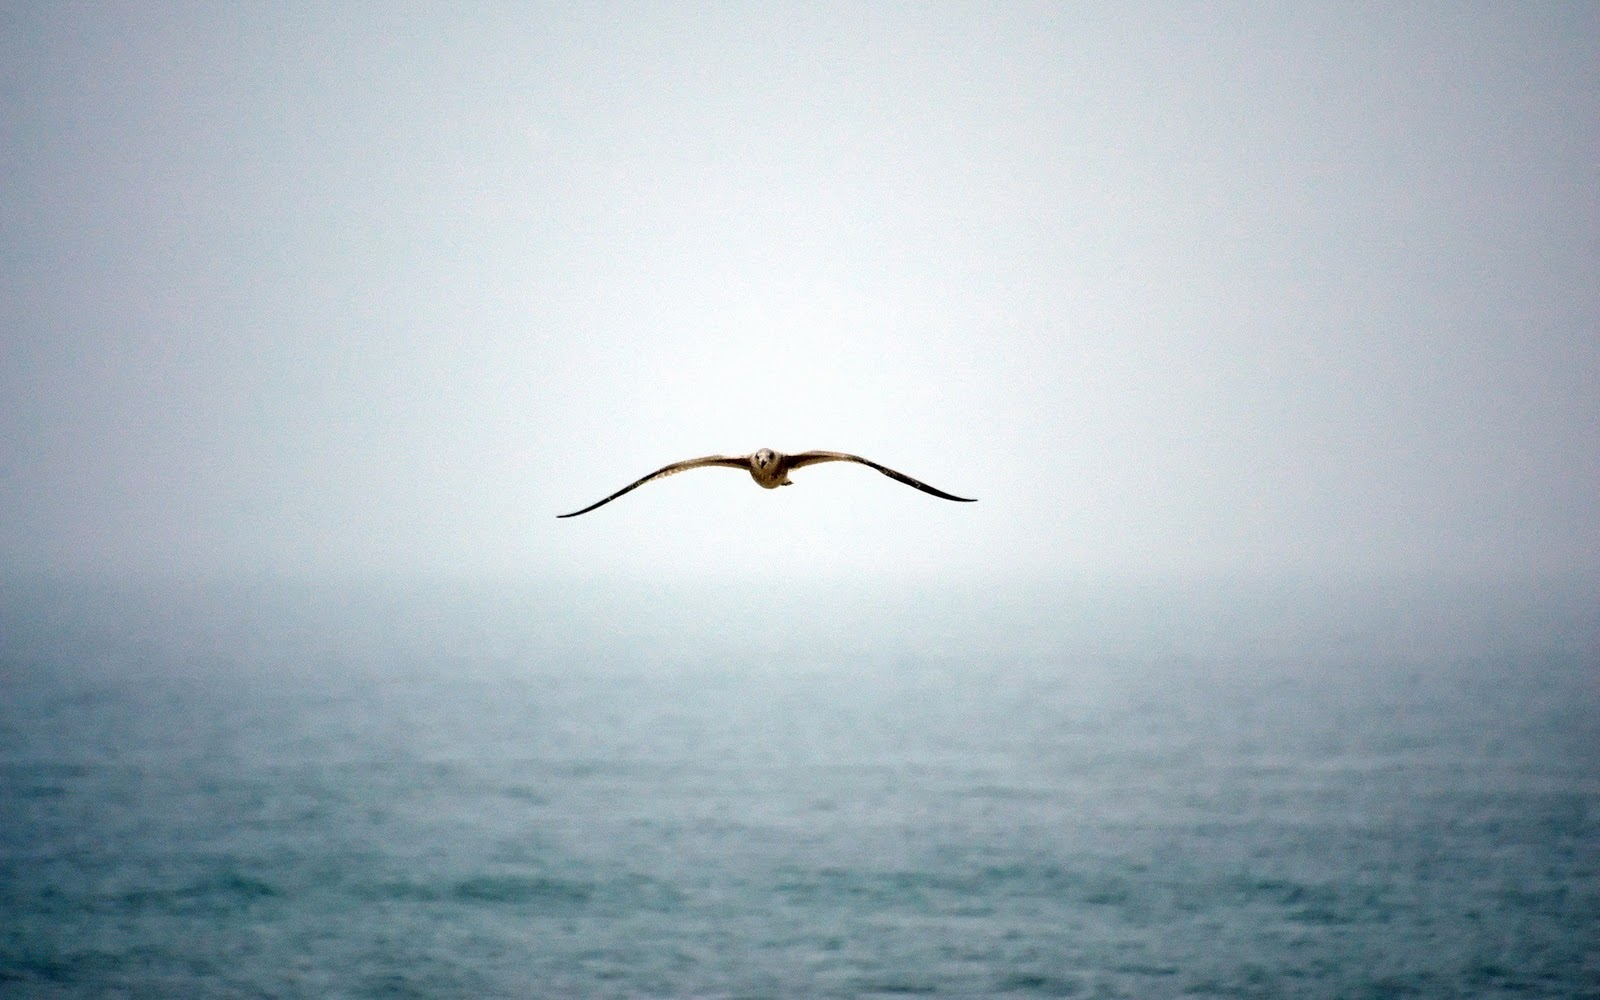 http://1.bp.blogspot.com/_JUeF8tYbiVw/TQivwEhJW2I/AAAAAAAAB18/f2hvHJhuxBs/s1600/flying-bird.jpg